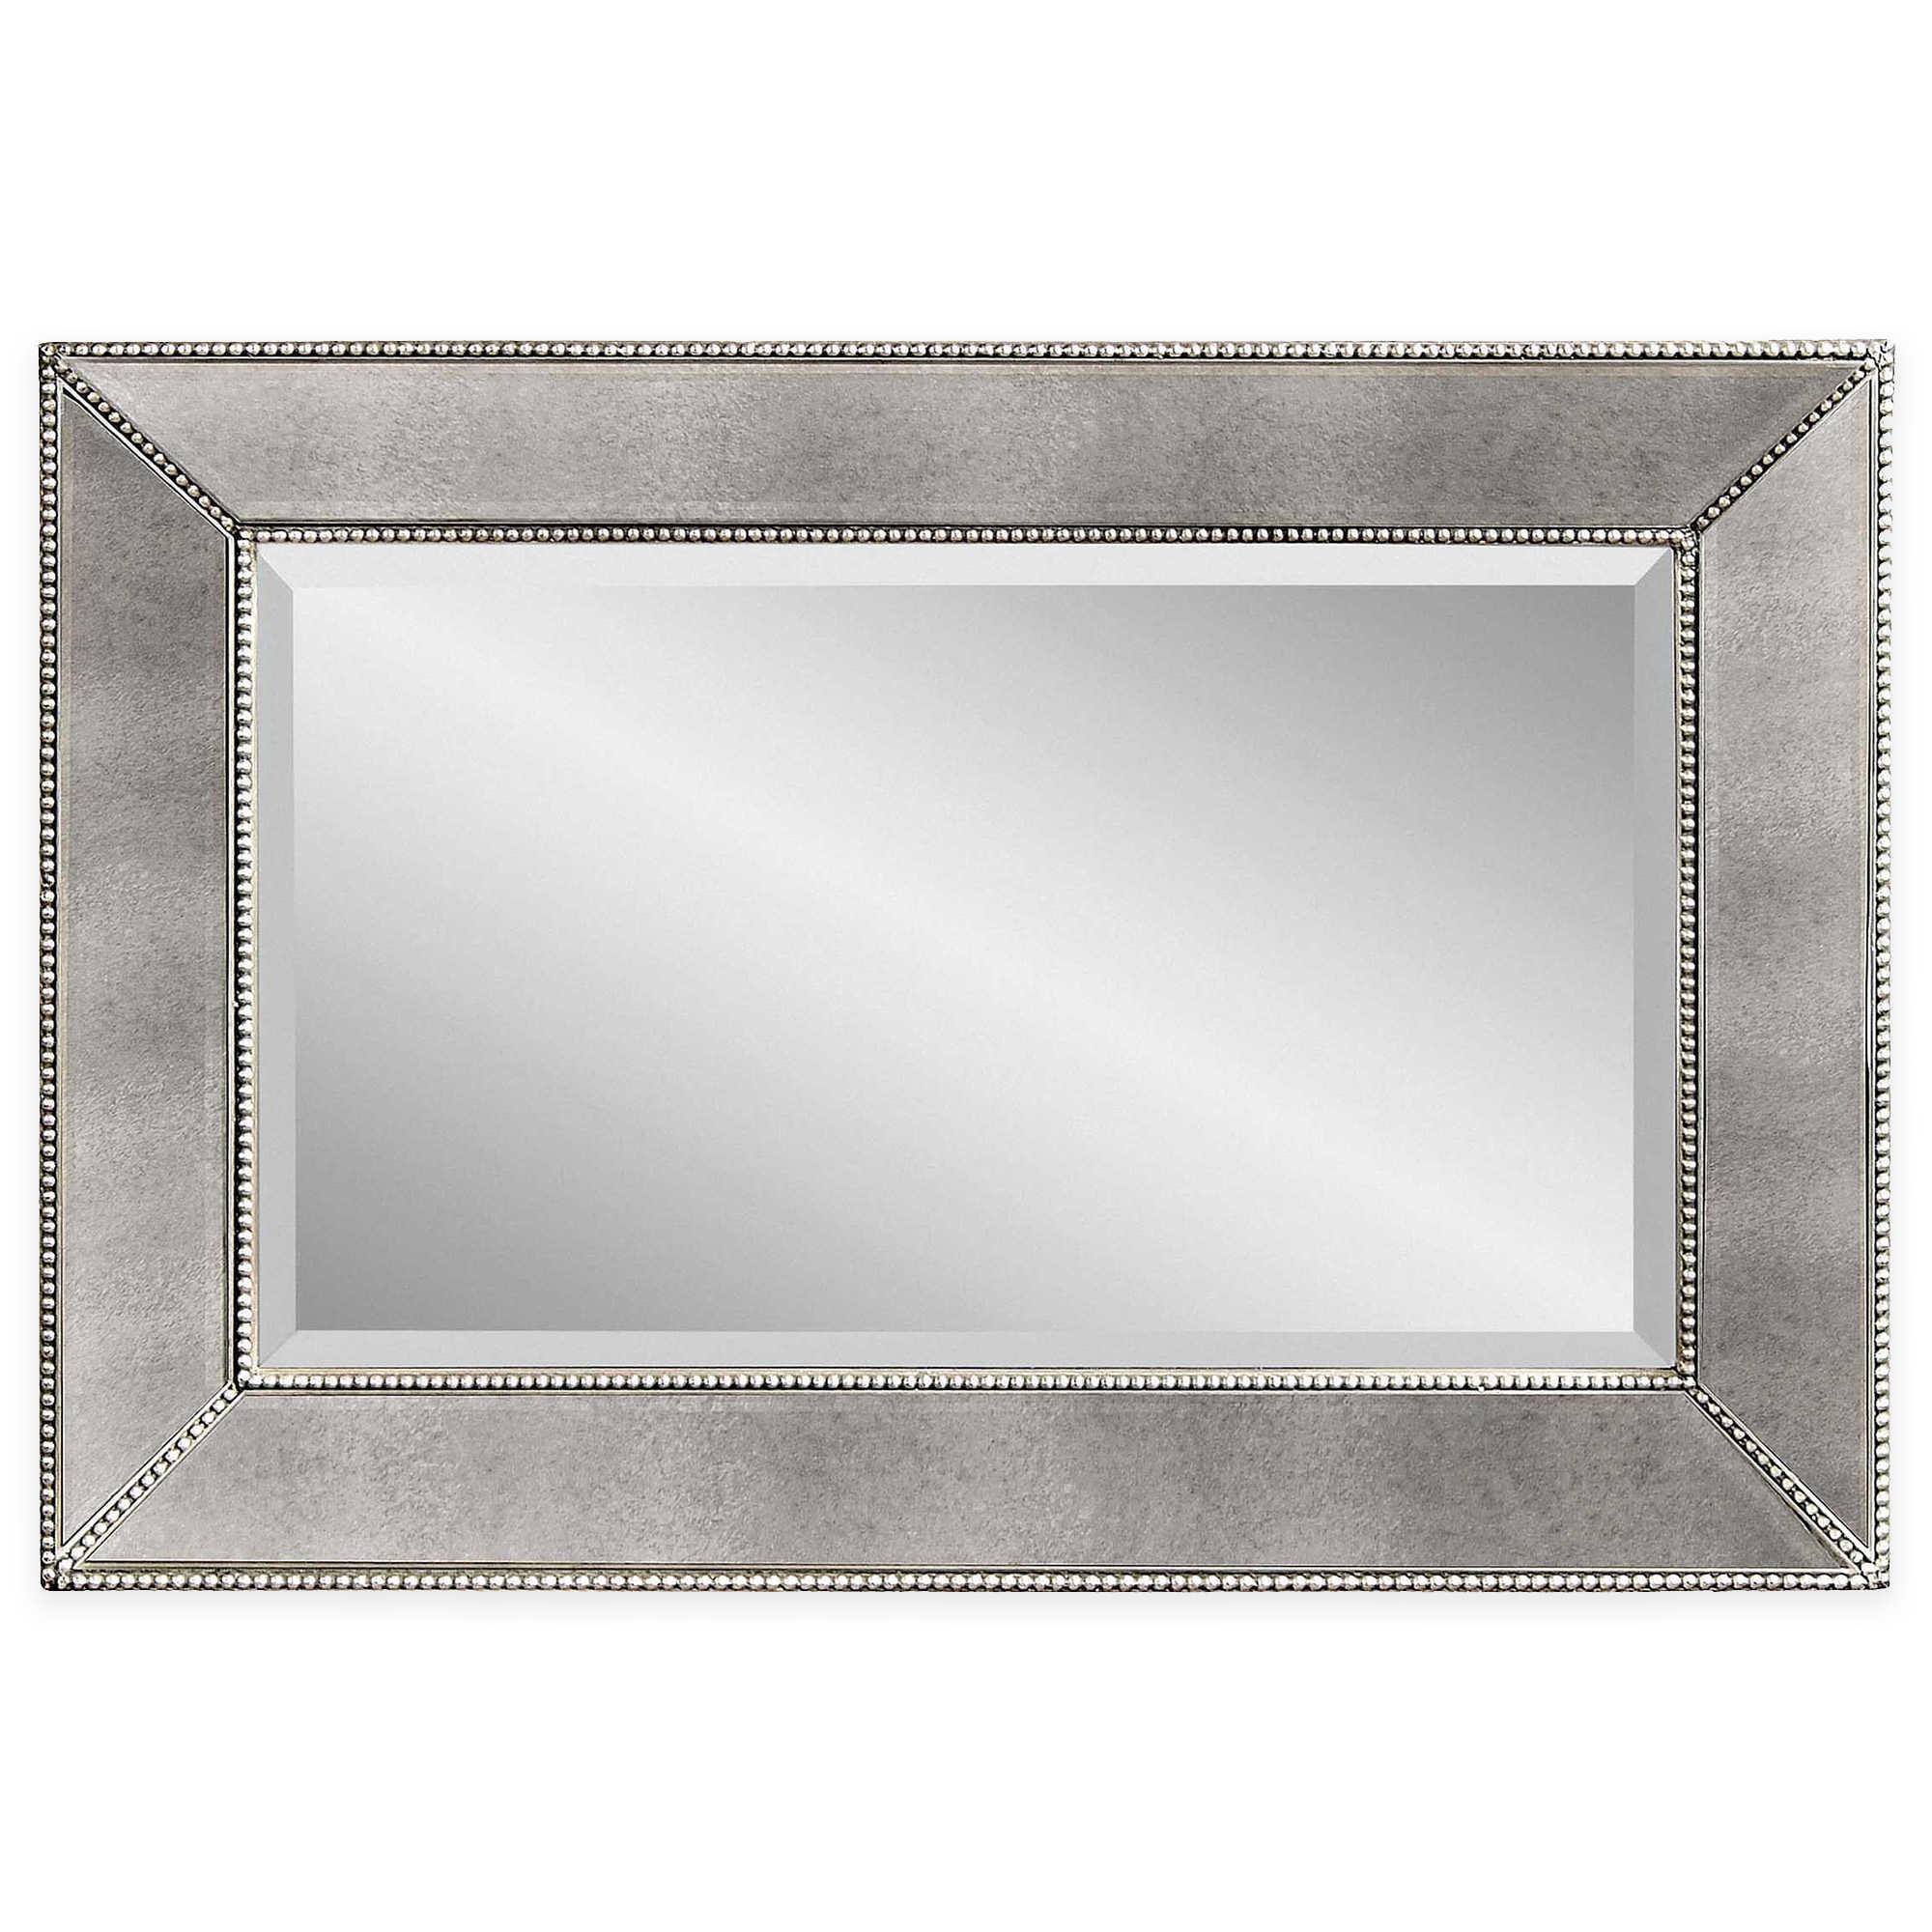 antique silver mirror images